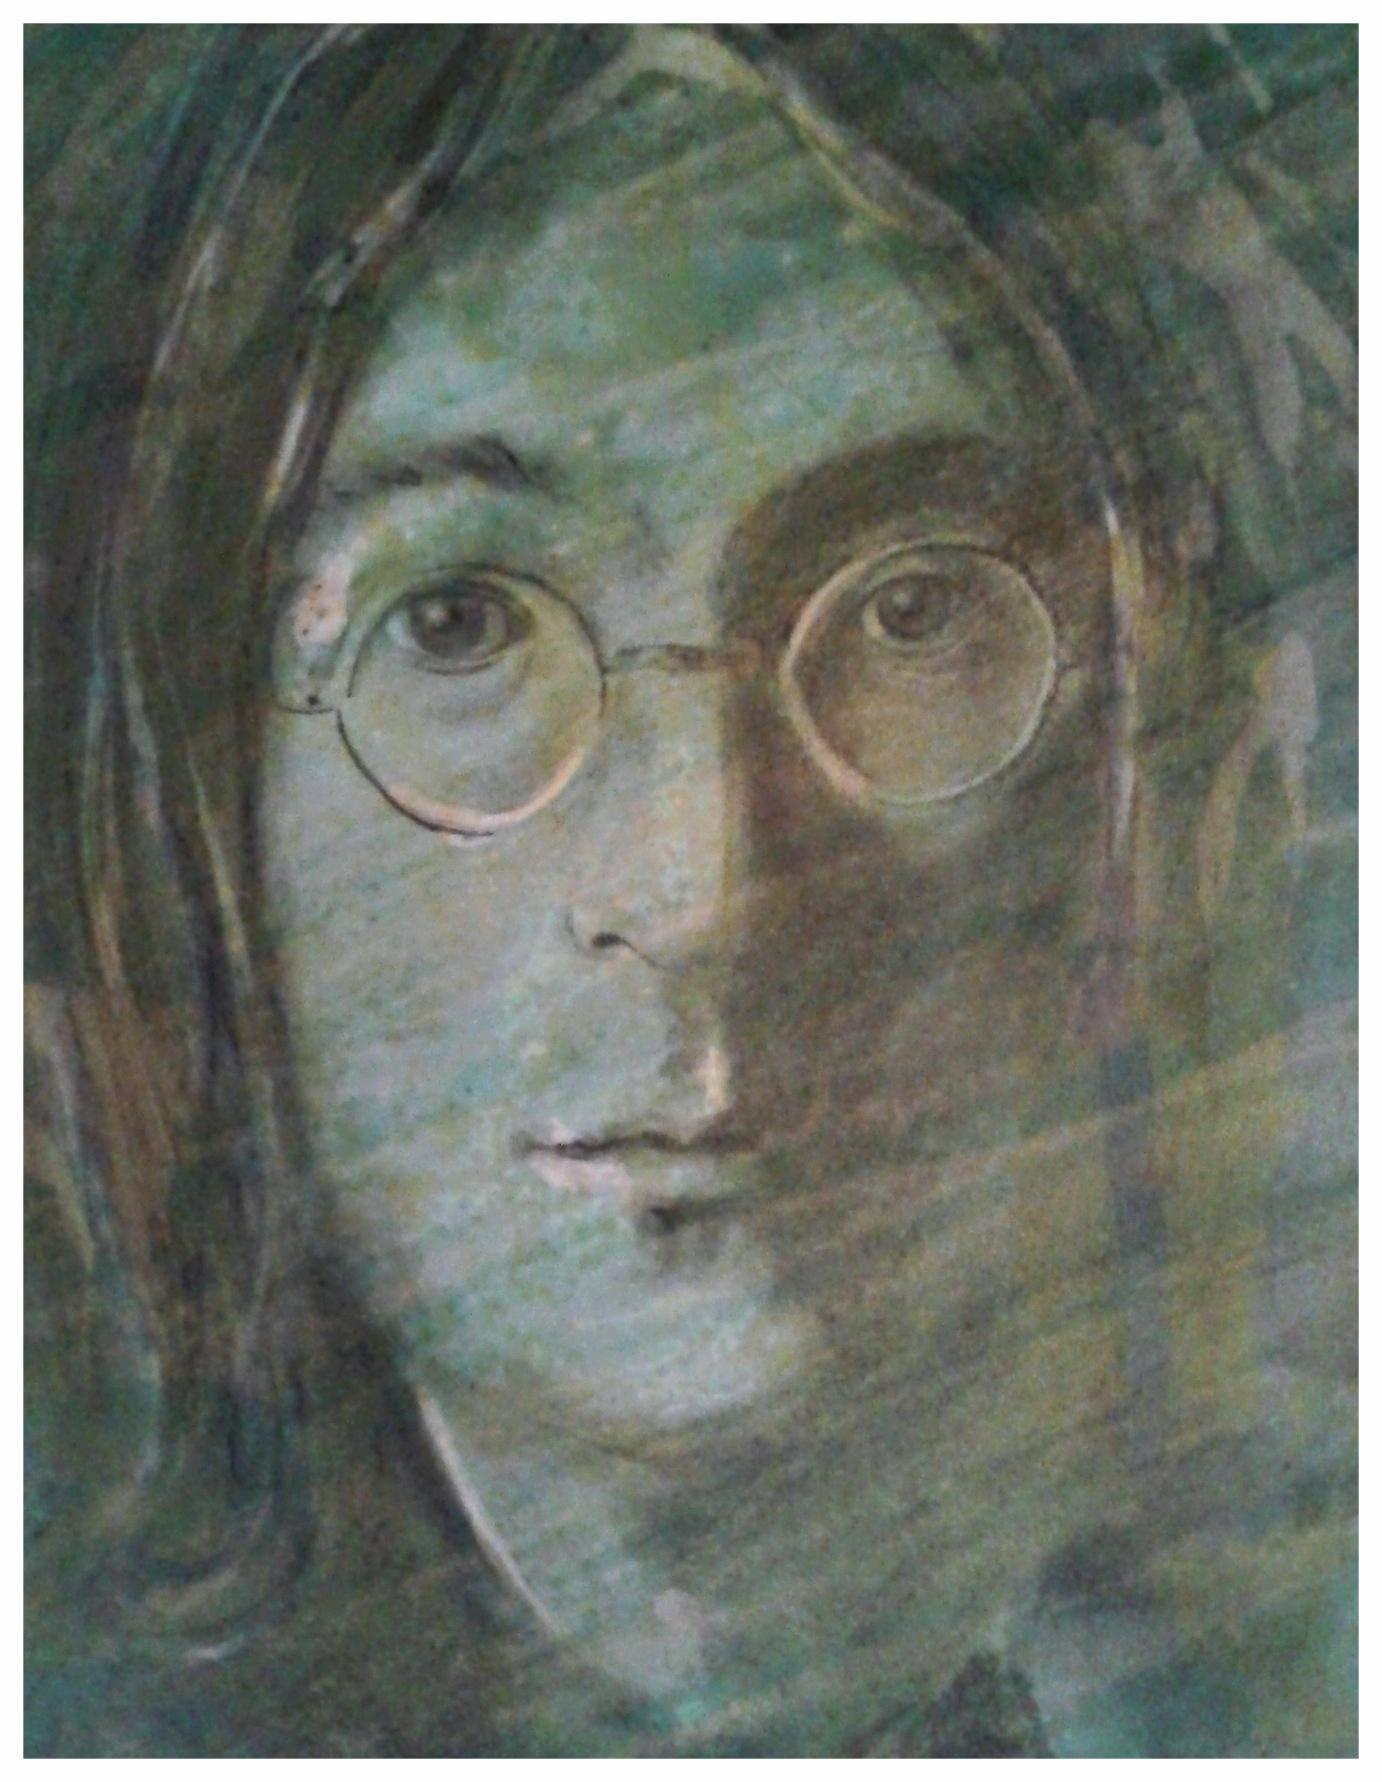 ART HFrei - John Lennon